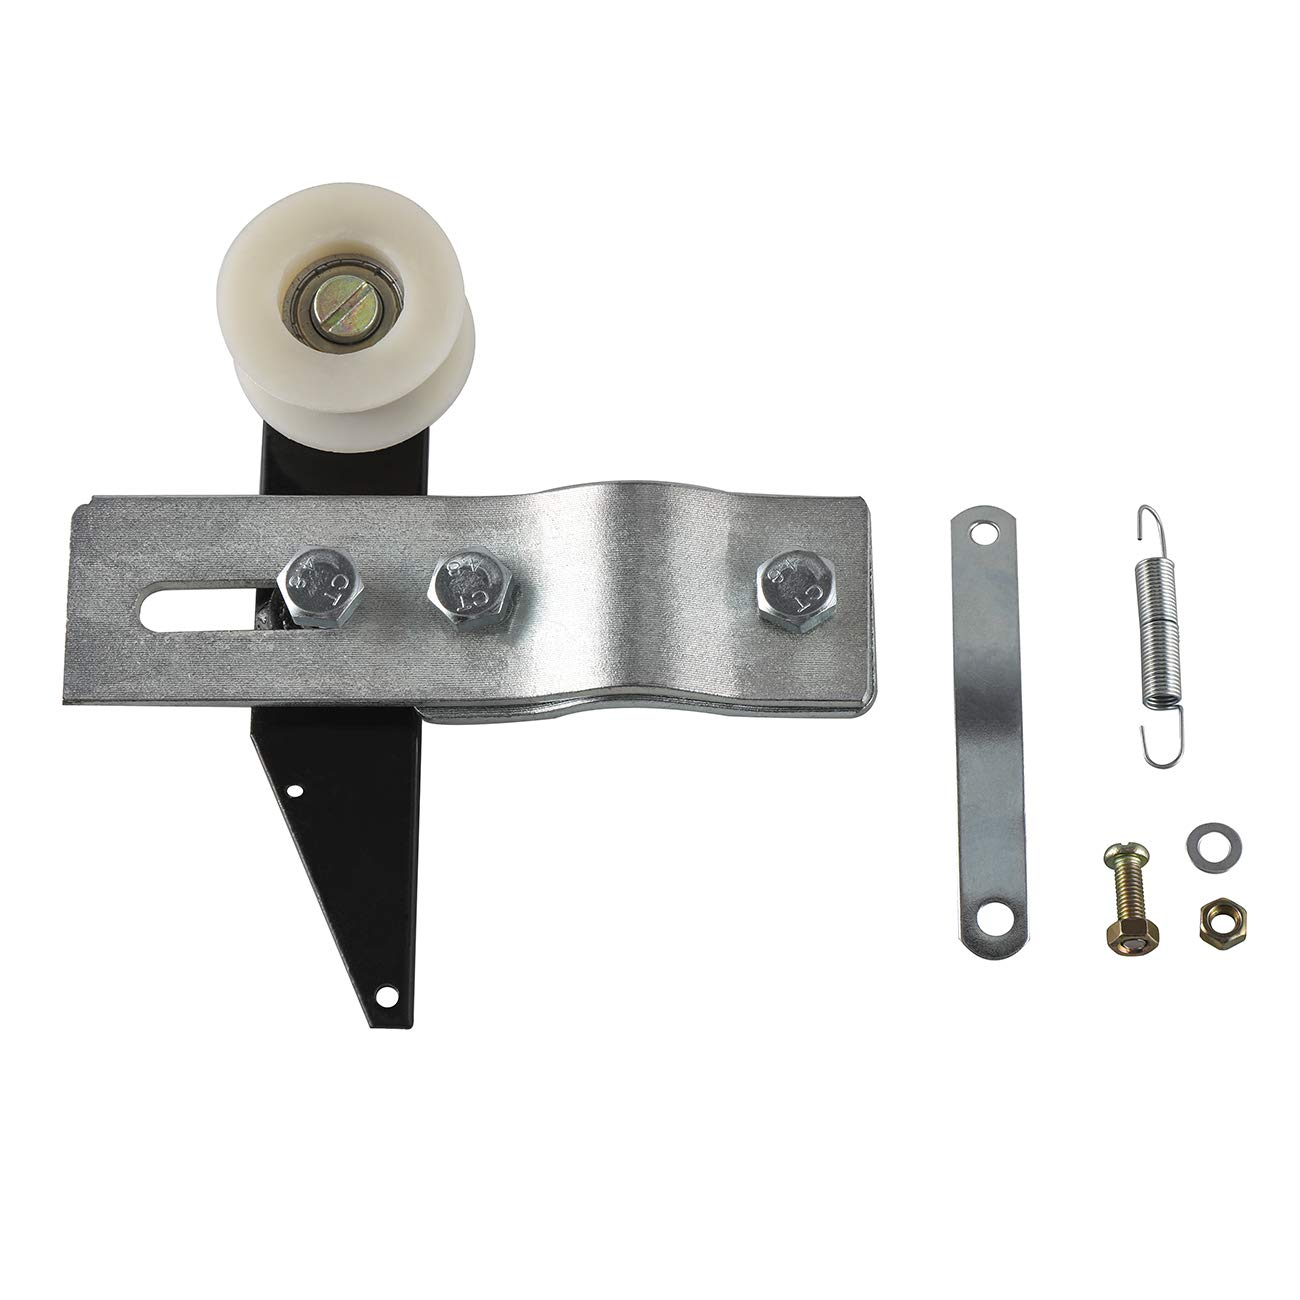 JRL 80cc Motor Bike Gas Engine Parts - Spring Bearing Chain Idler Tensioner & Pulley by JRL